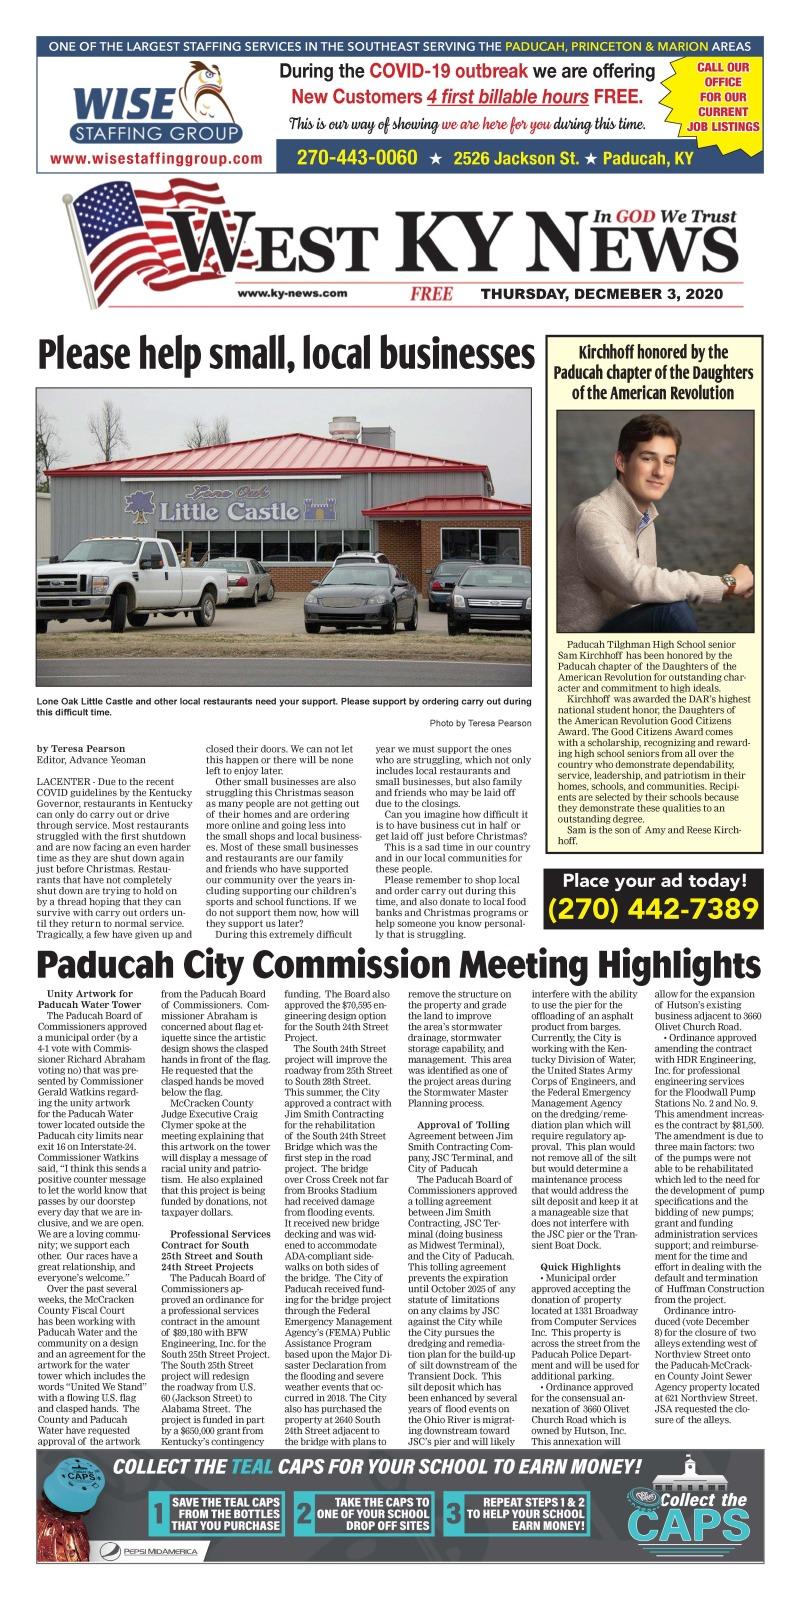 West KY News 12-3-20